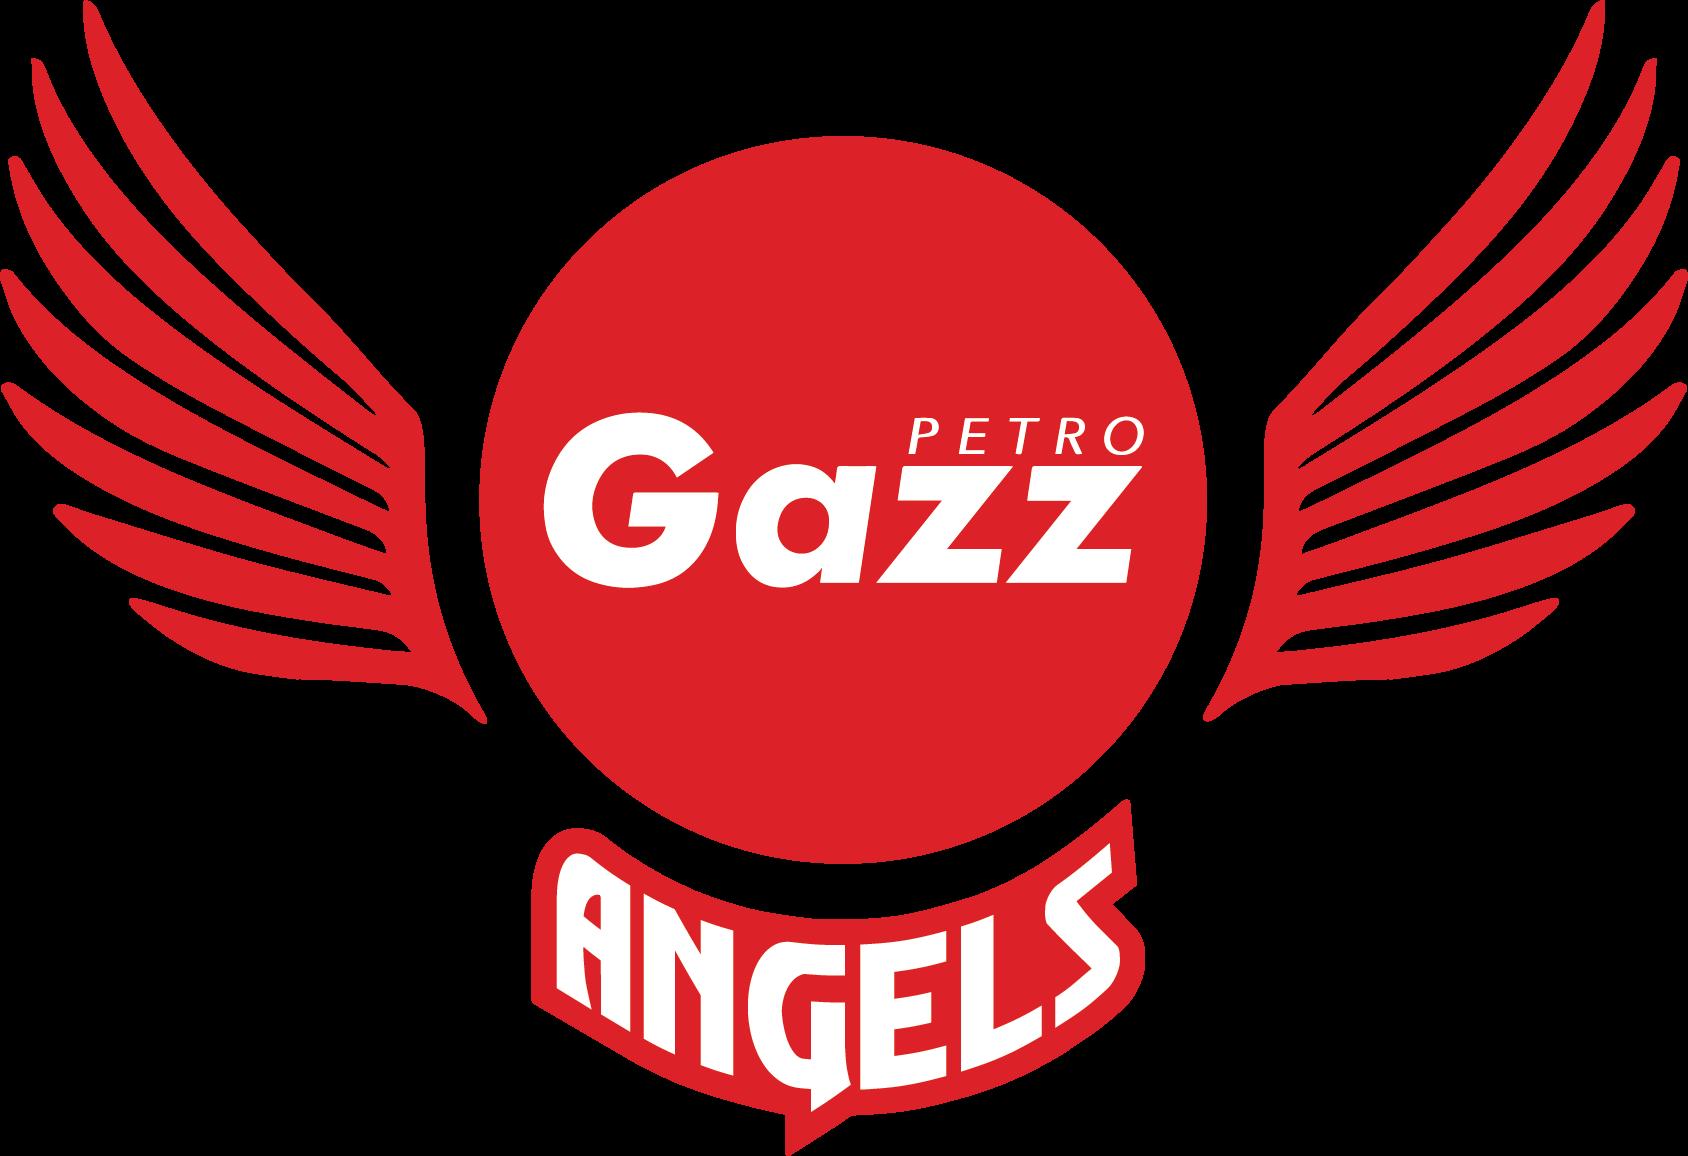 PETROGAZZ ANGELS